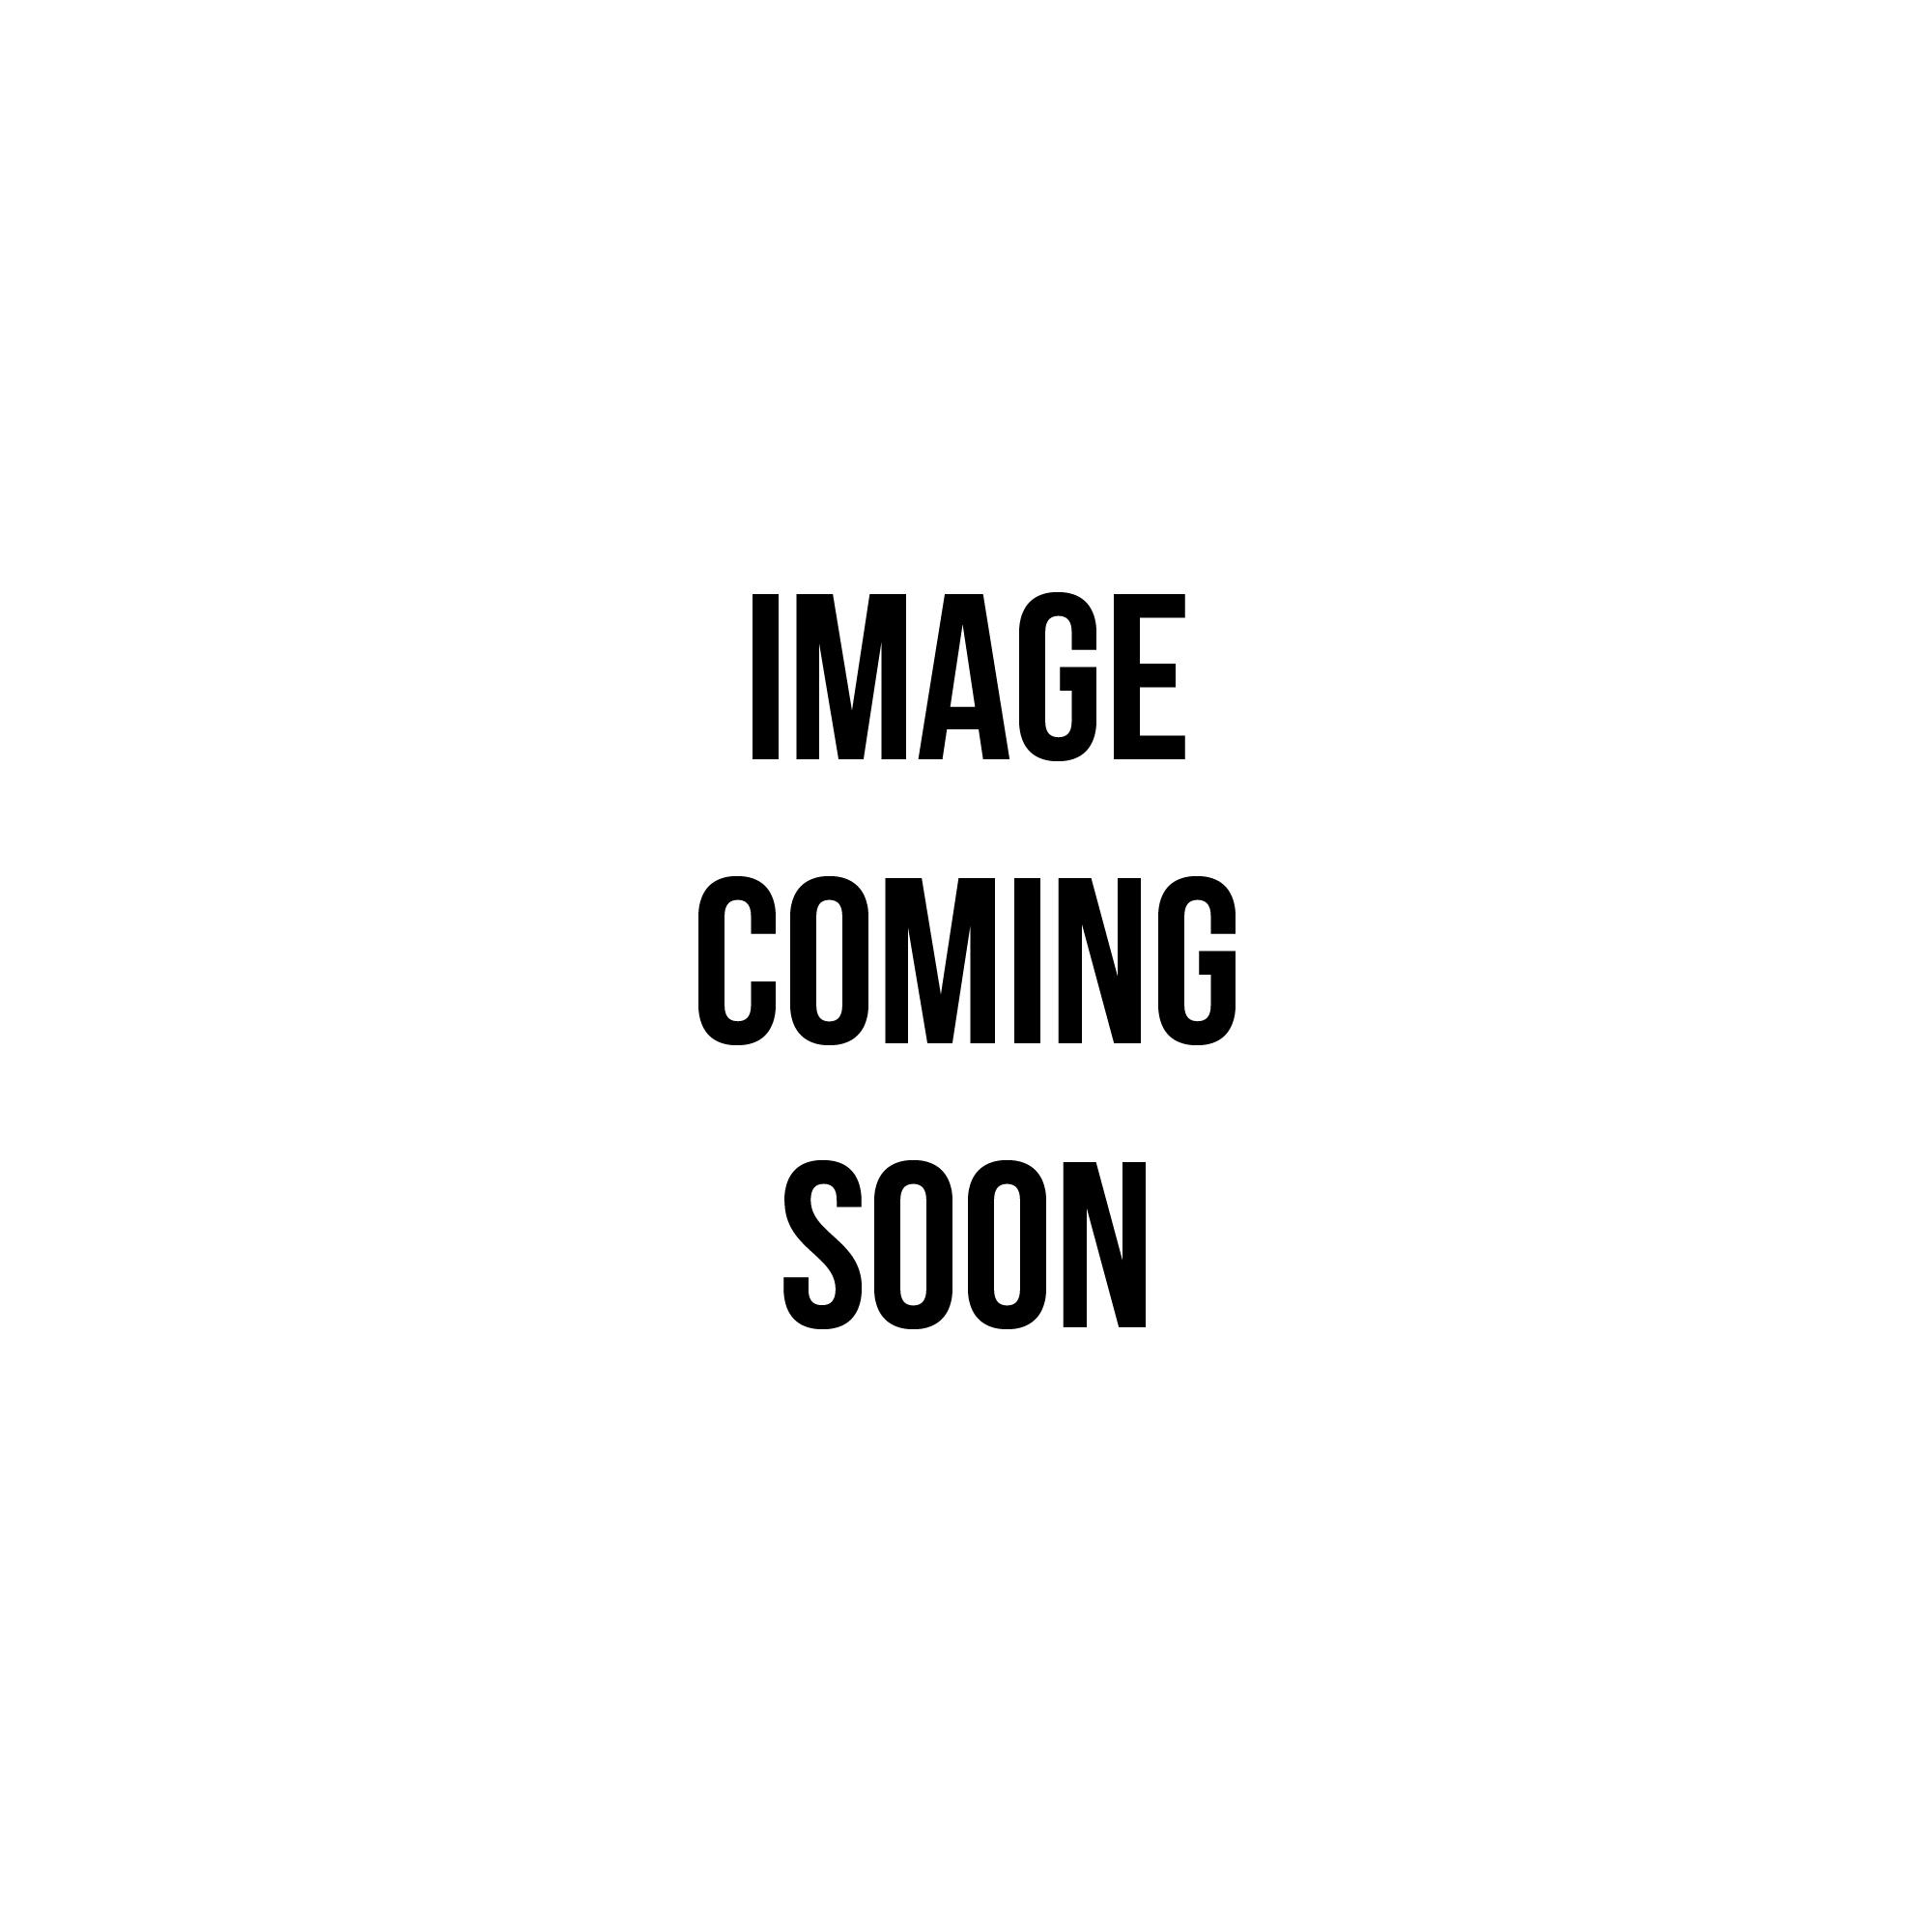 Nike Air Jordan 1 Chaussures De Basket-ball De Vol Gris Foncé / Blanc   /  / Noir Fuchsia